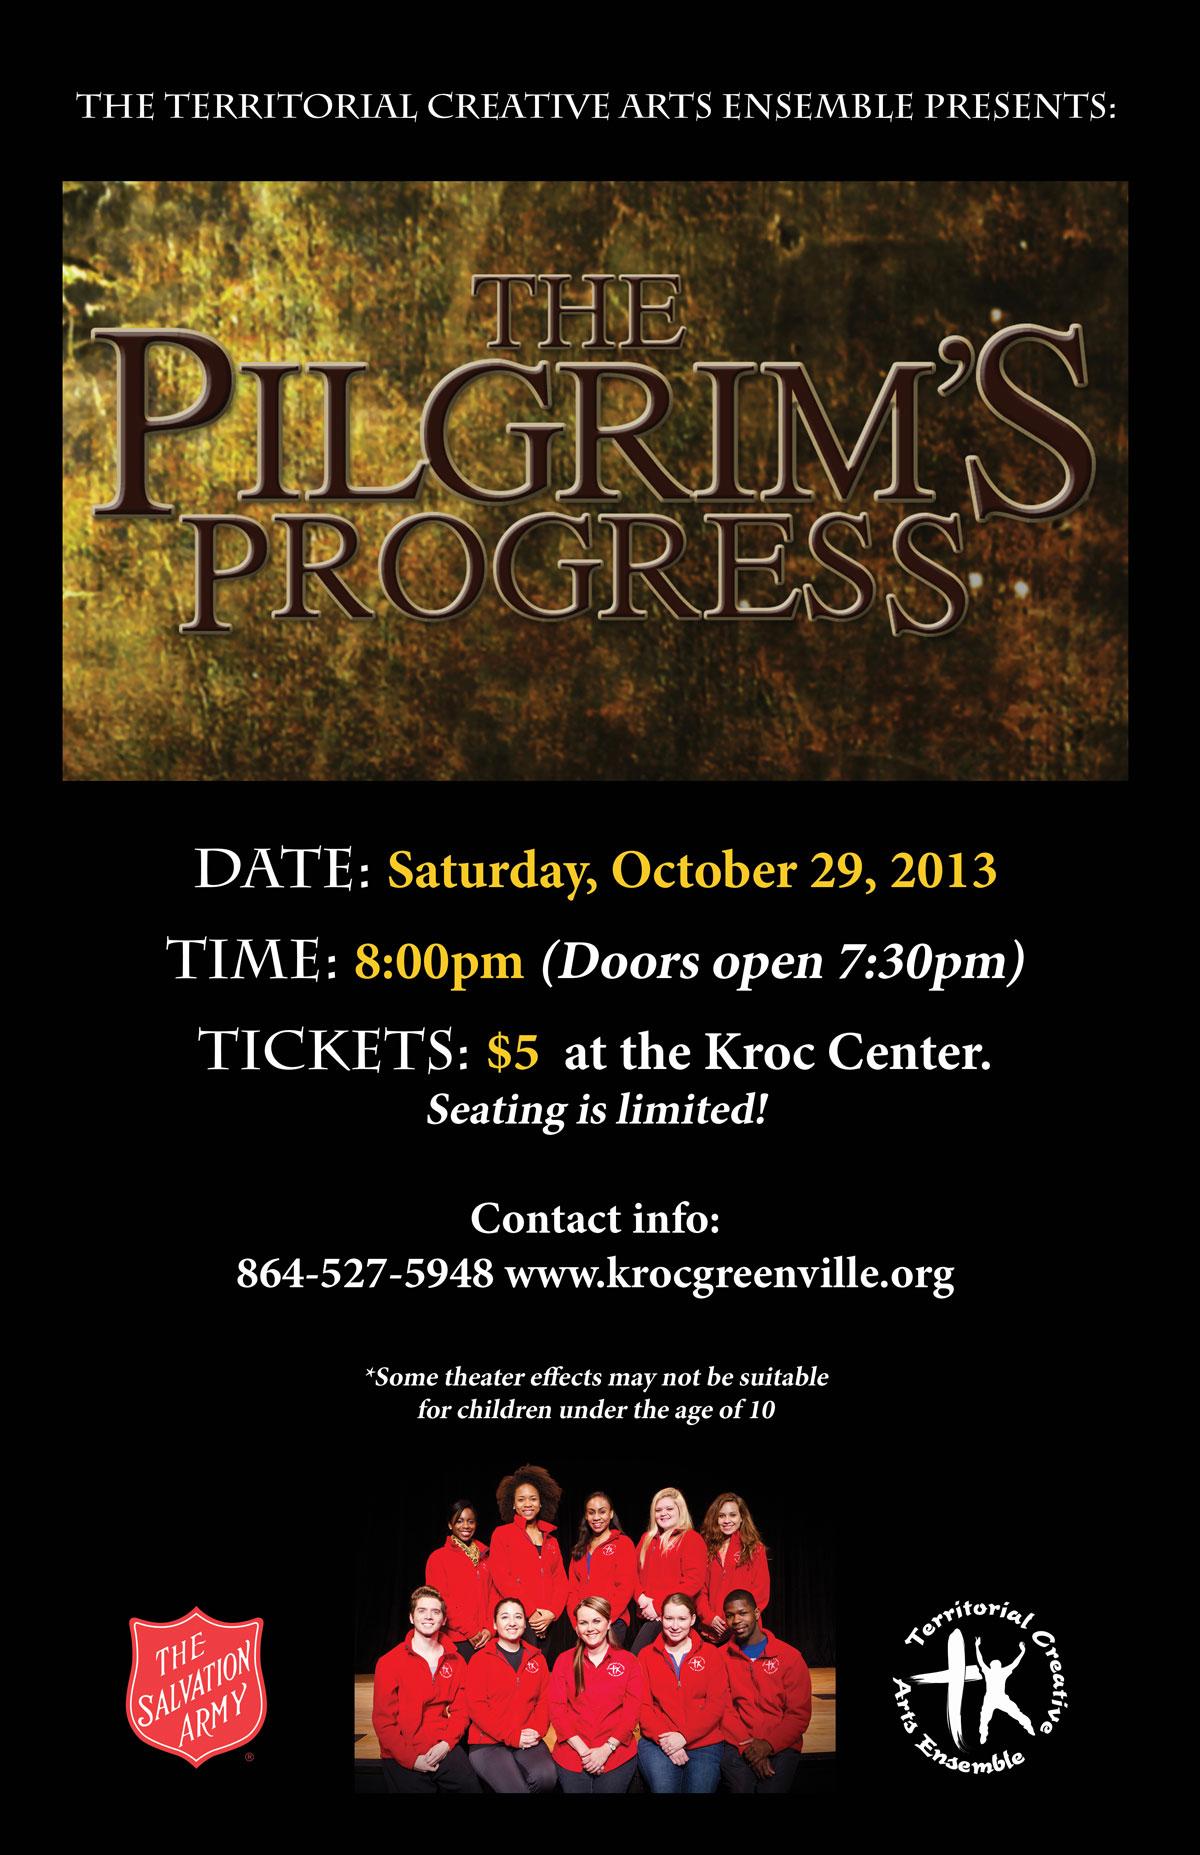 PilgrimsProgress-Web.jpg